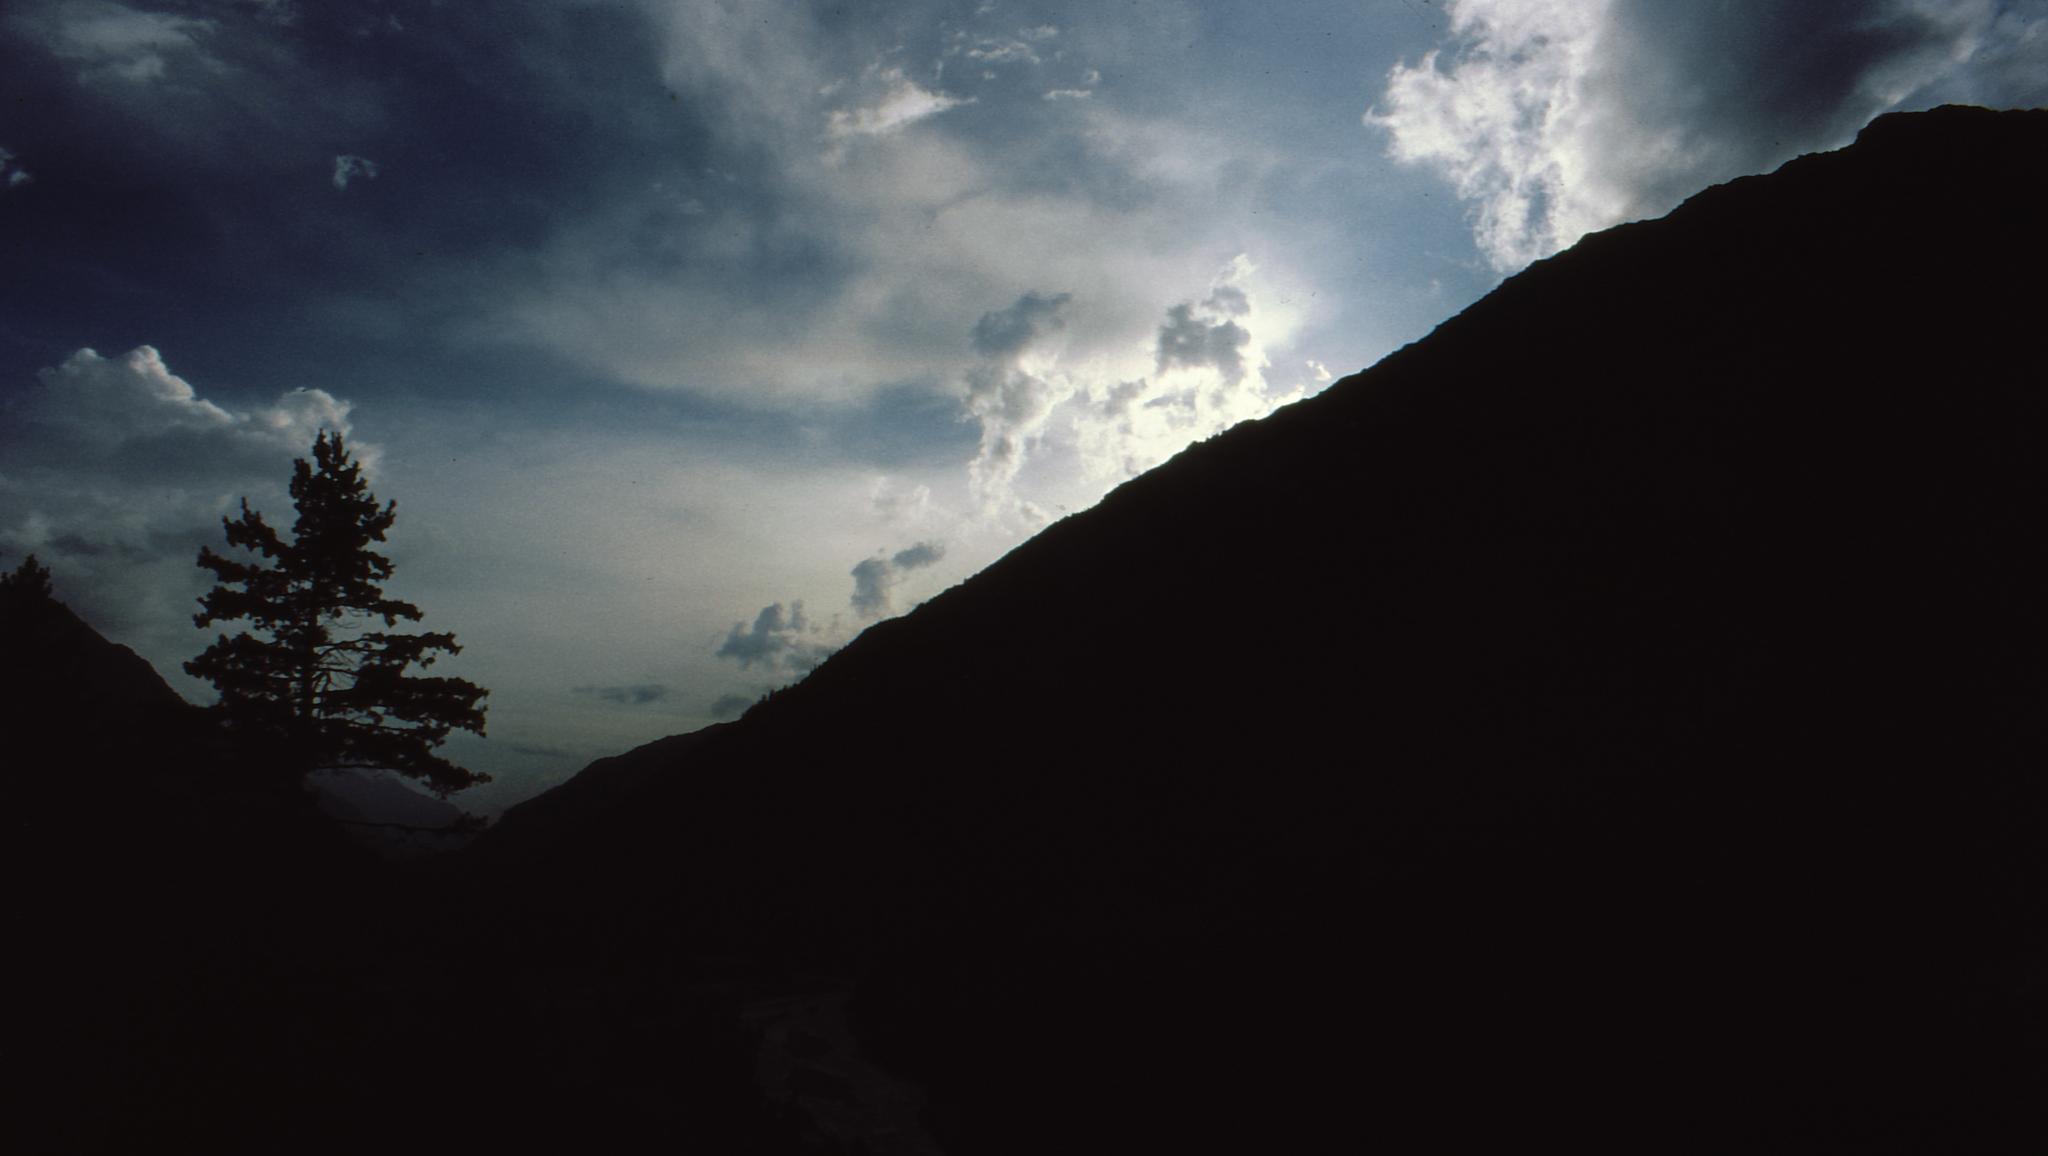 Stark solitude by GitiThadani